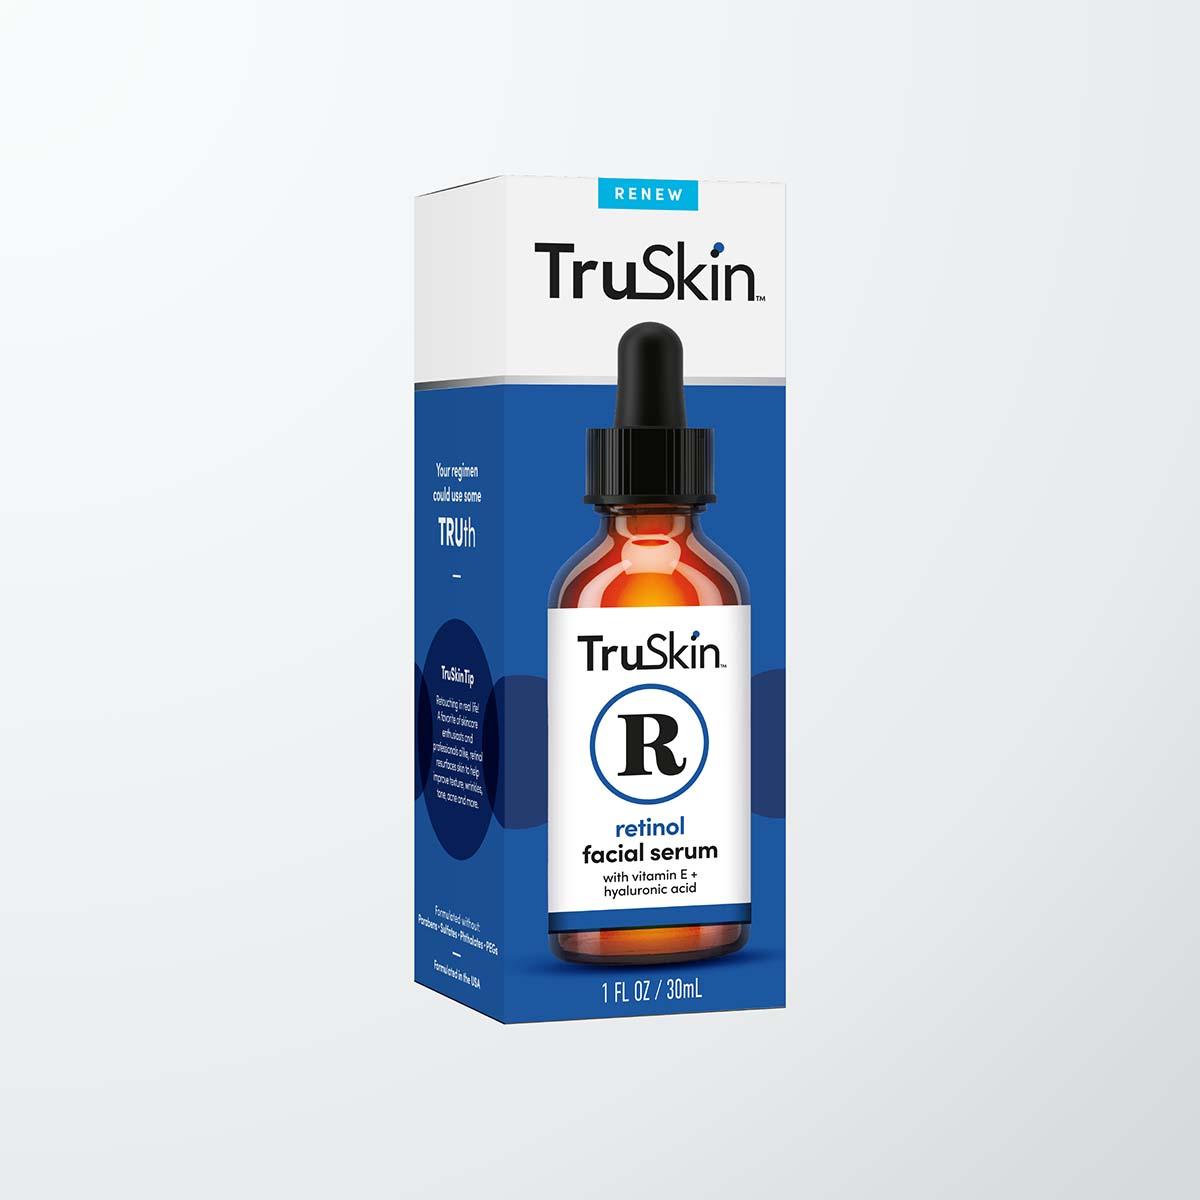 TruSkin Renew